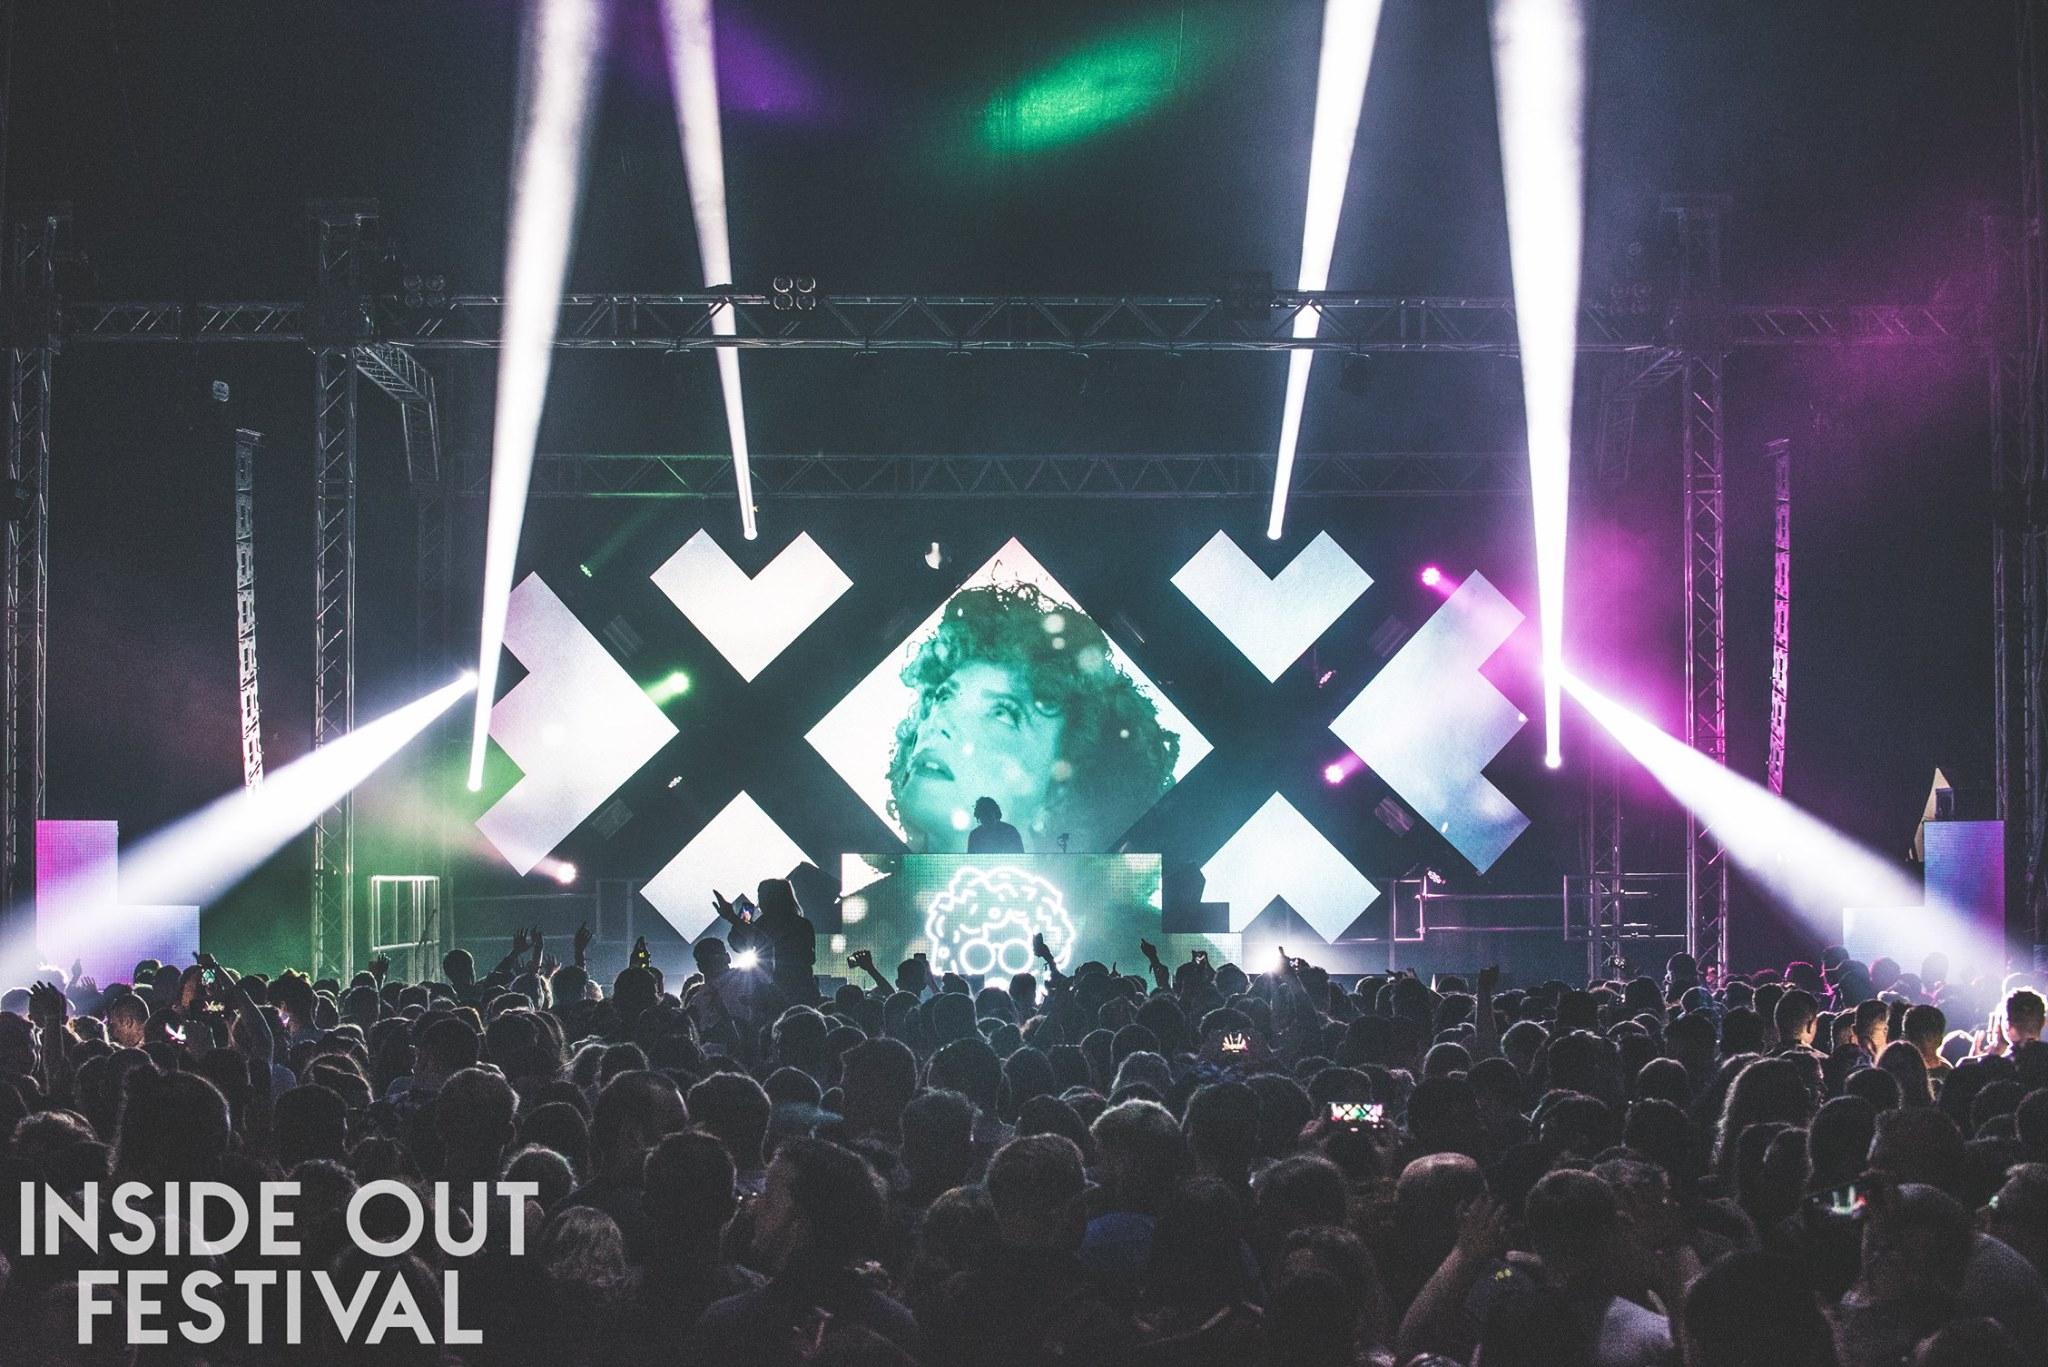 Inside Out Festival 2017